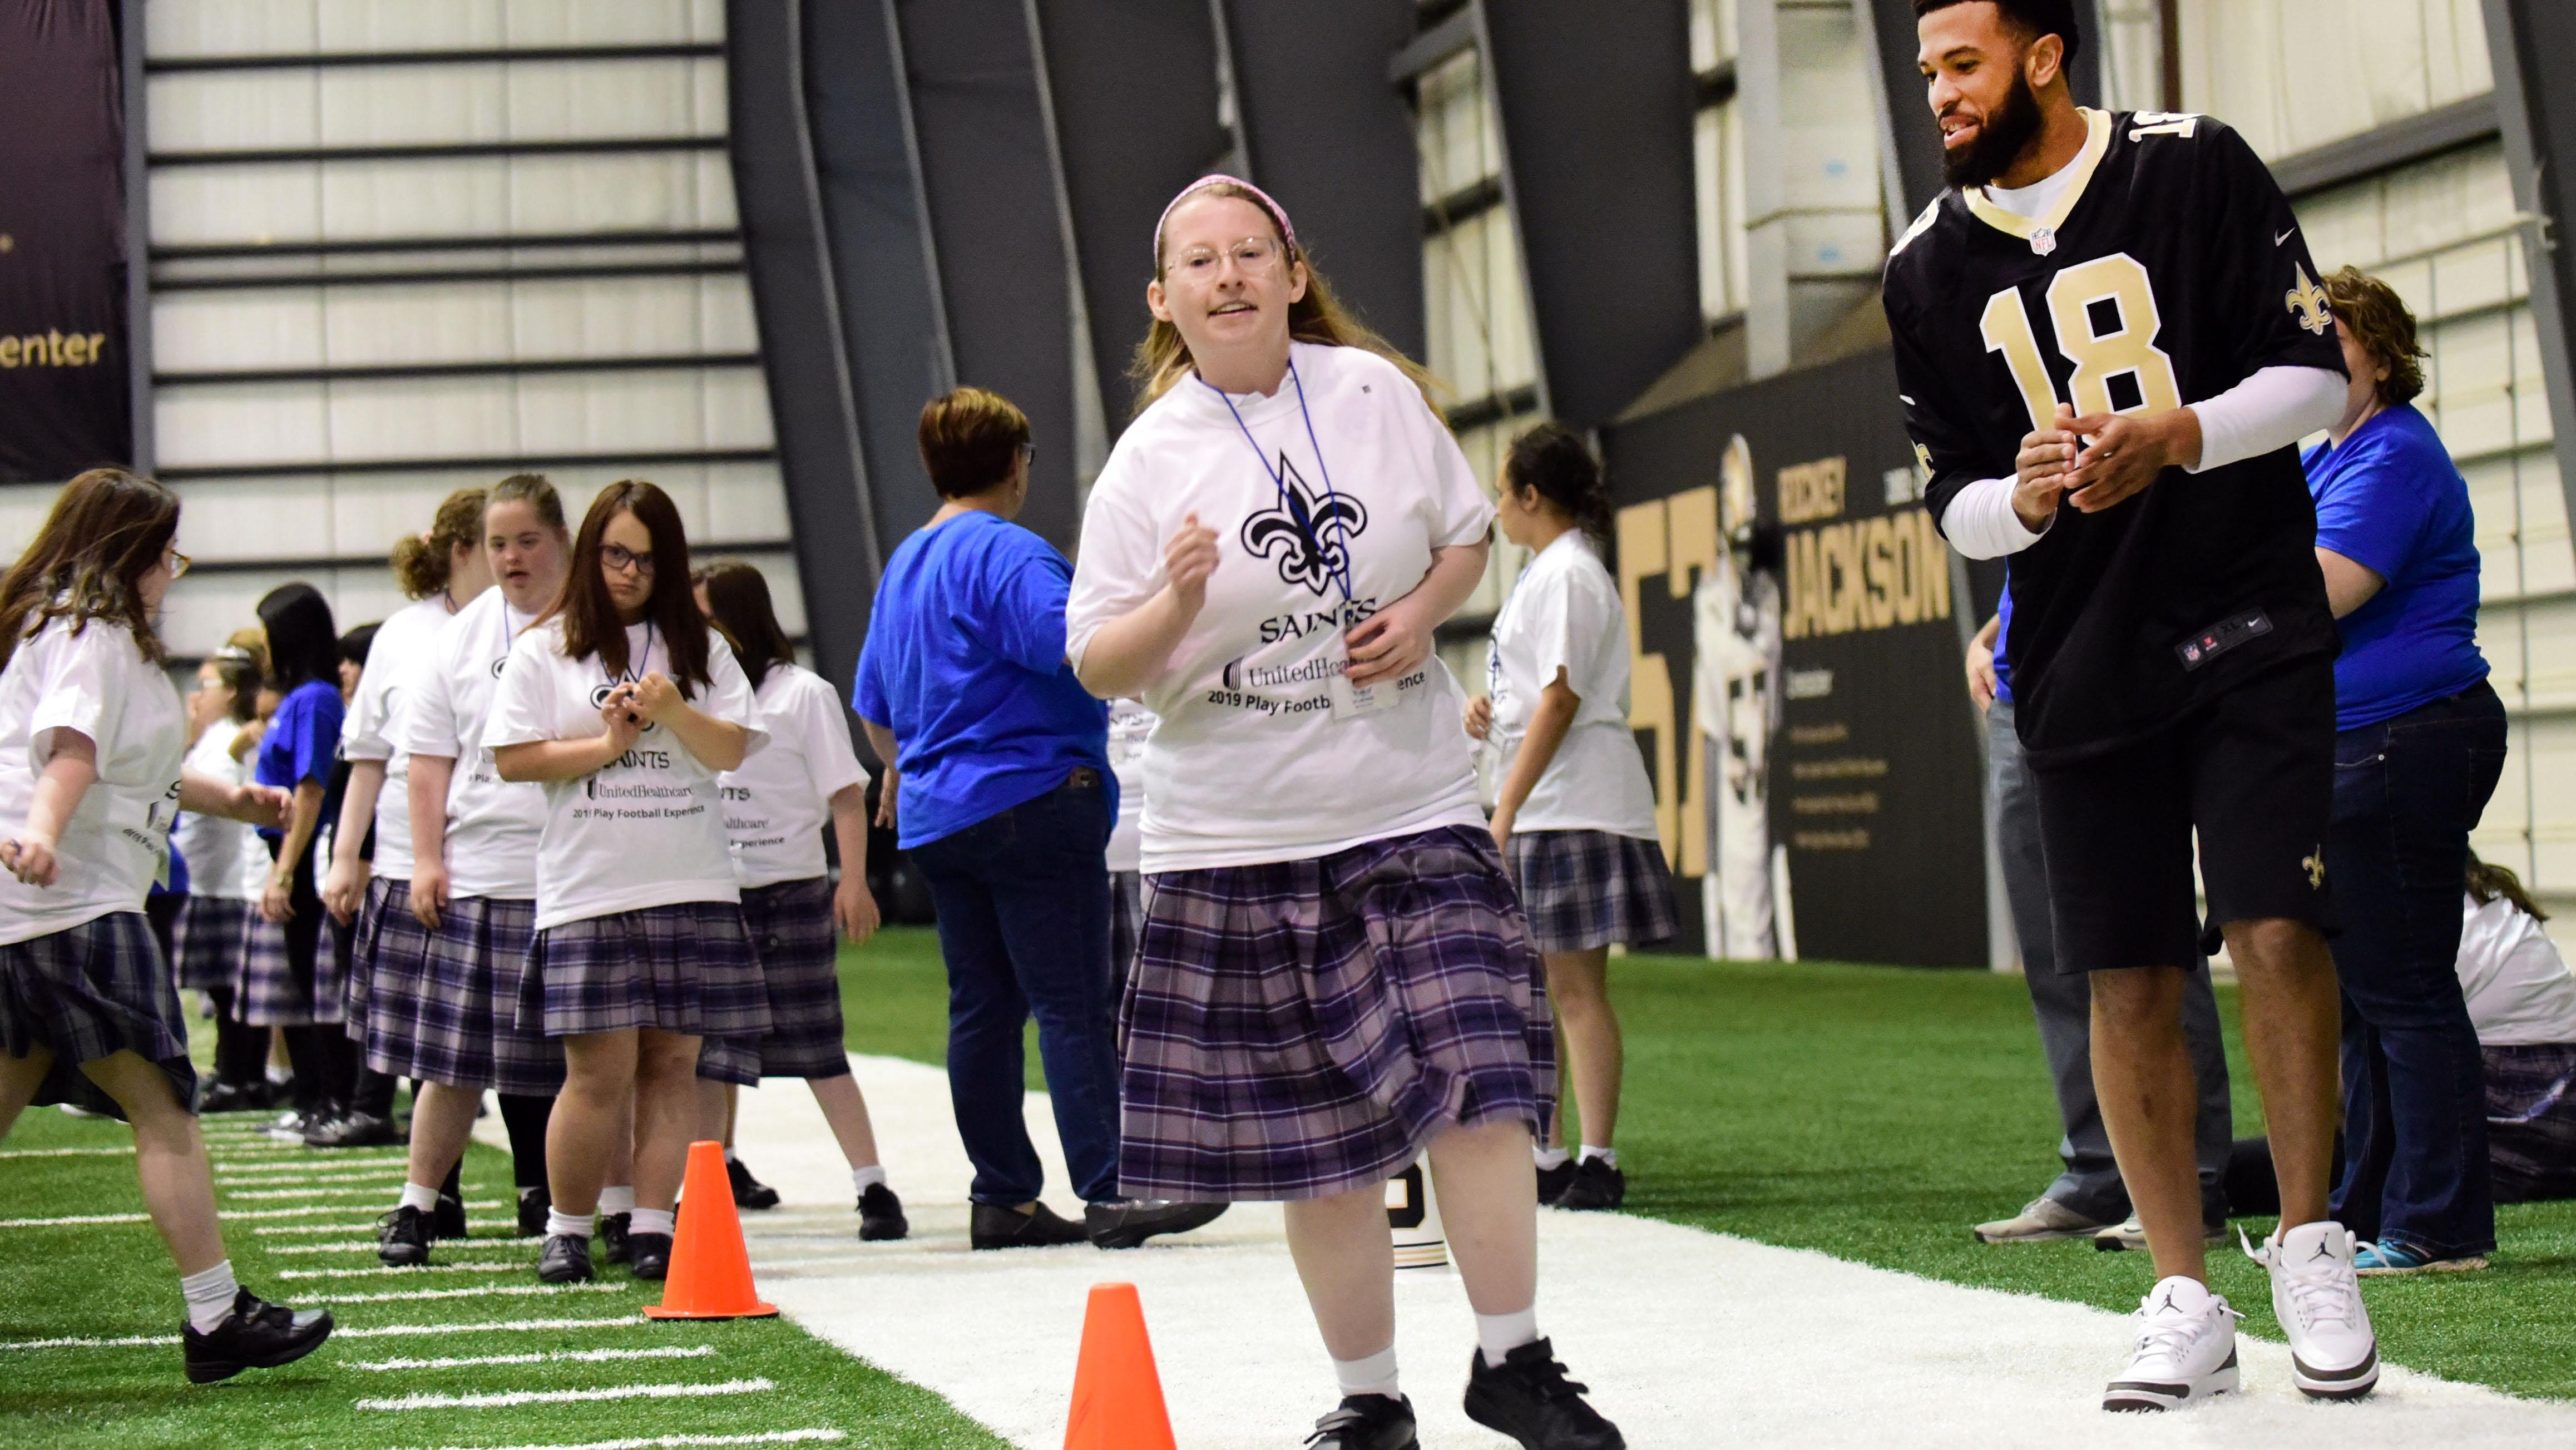 e6524ce9 Newsroom - UnitedHealthcare, New Orleans Saints Help Kids Get Active ...